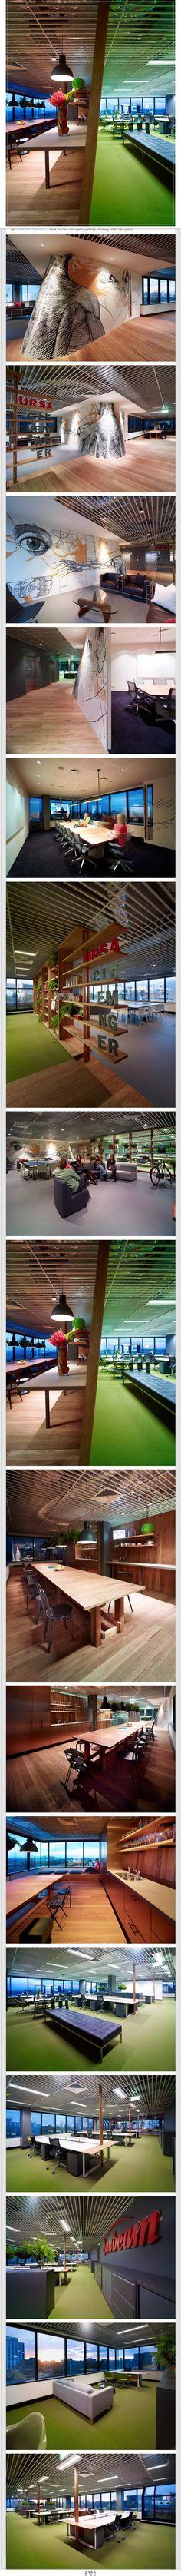 UrsaClemenger 헬스케어 광고에이전시 사무실 인테리어 Quick Look: UrsaClemenger's Sydney Offices   UrsaClemenger는 시드니에 위치한 헬스케어 광고 및 브랜딩 에이전시 입니다. 사무실 이전을 하며 인테리어를 리모델링 했습니다.  사무실 전체가 막혀있지 않고 오픈되어 있어 시원한 느낌을 주는 것 같습니다. 그리고 역시 최고는 직원들의 휴식공간이 아닌가 싶은데 키친(식당이라고 하기도 그렇고 탕비실이라고 하면 너무 옜날말 같고 해서)이 깔끔하게 넓은 테이블과 함께 위치 하고 있습니다.